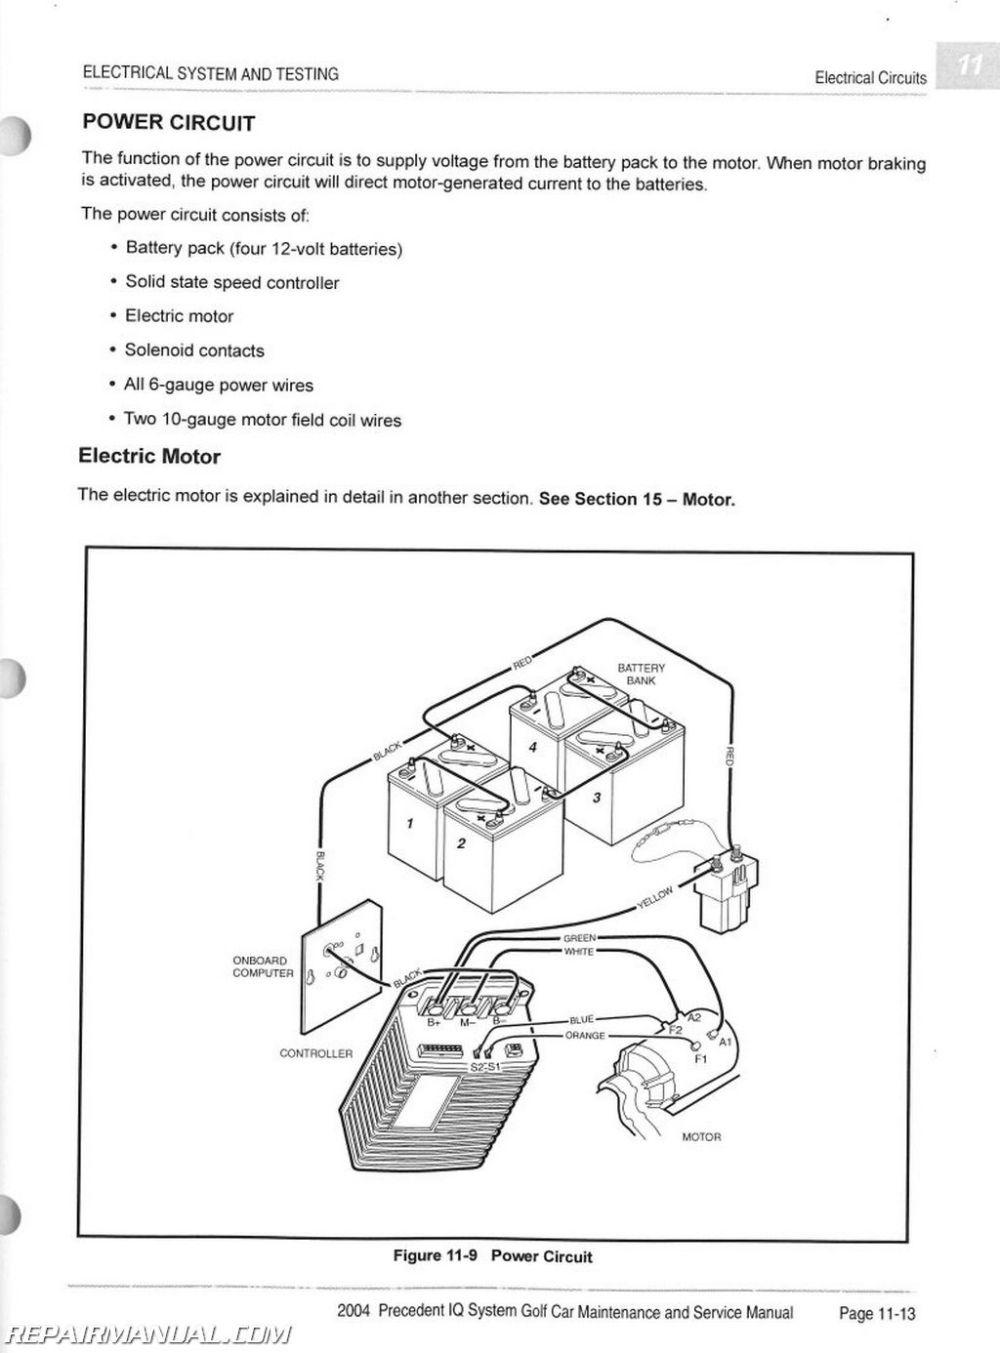 medium resolution of  wiring diagram for precedent wiring diagram h10 on 2007 ezgo wiring diagram club car